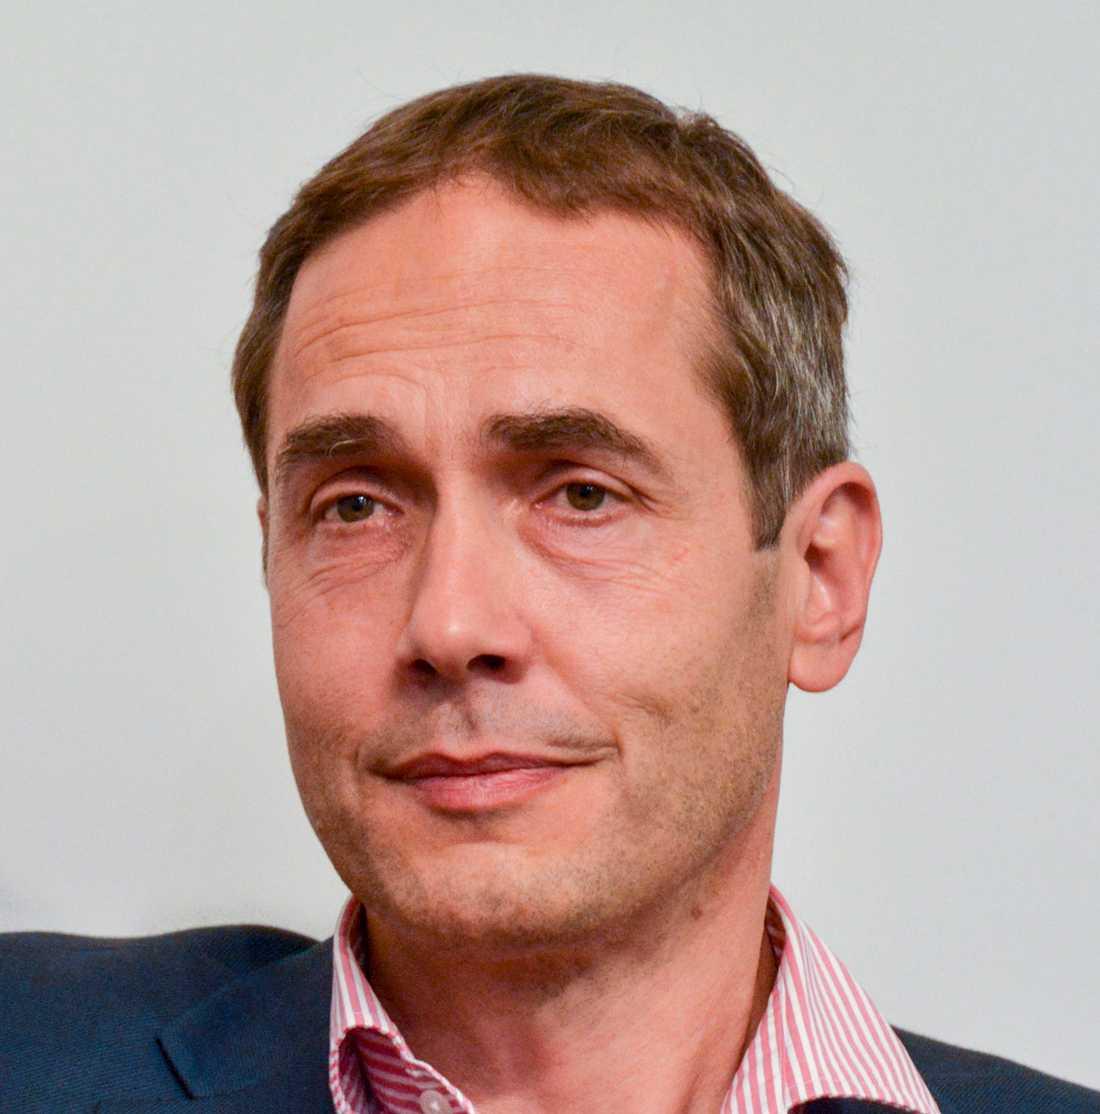 Mats Malm